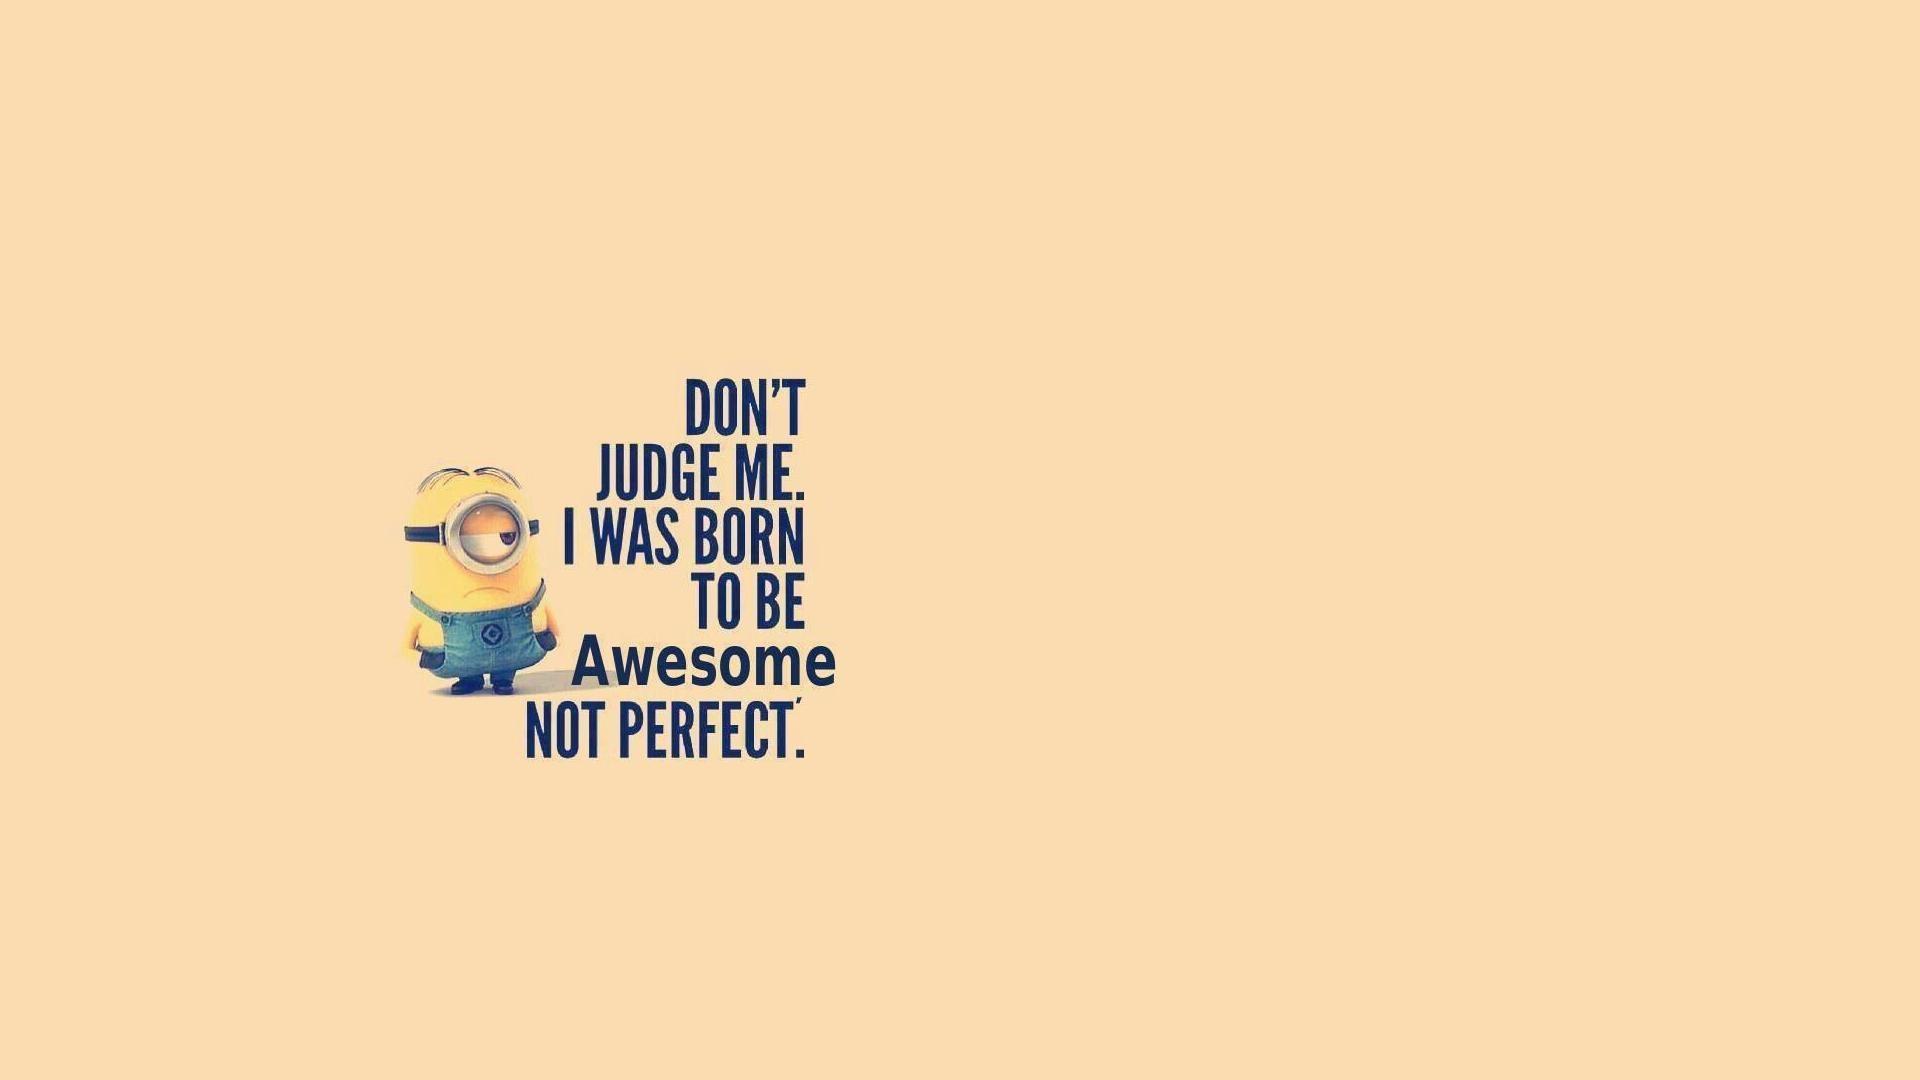 Minion Wallpaper For Desktop Quotes QuotesGram 1920x1080